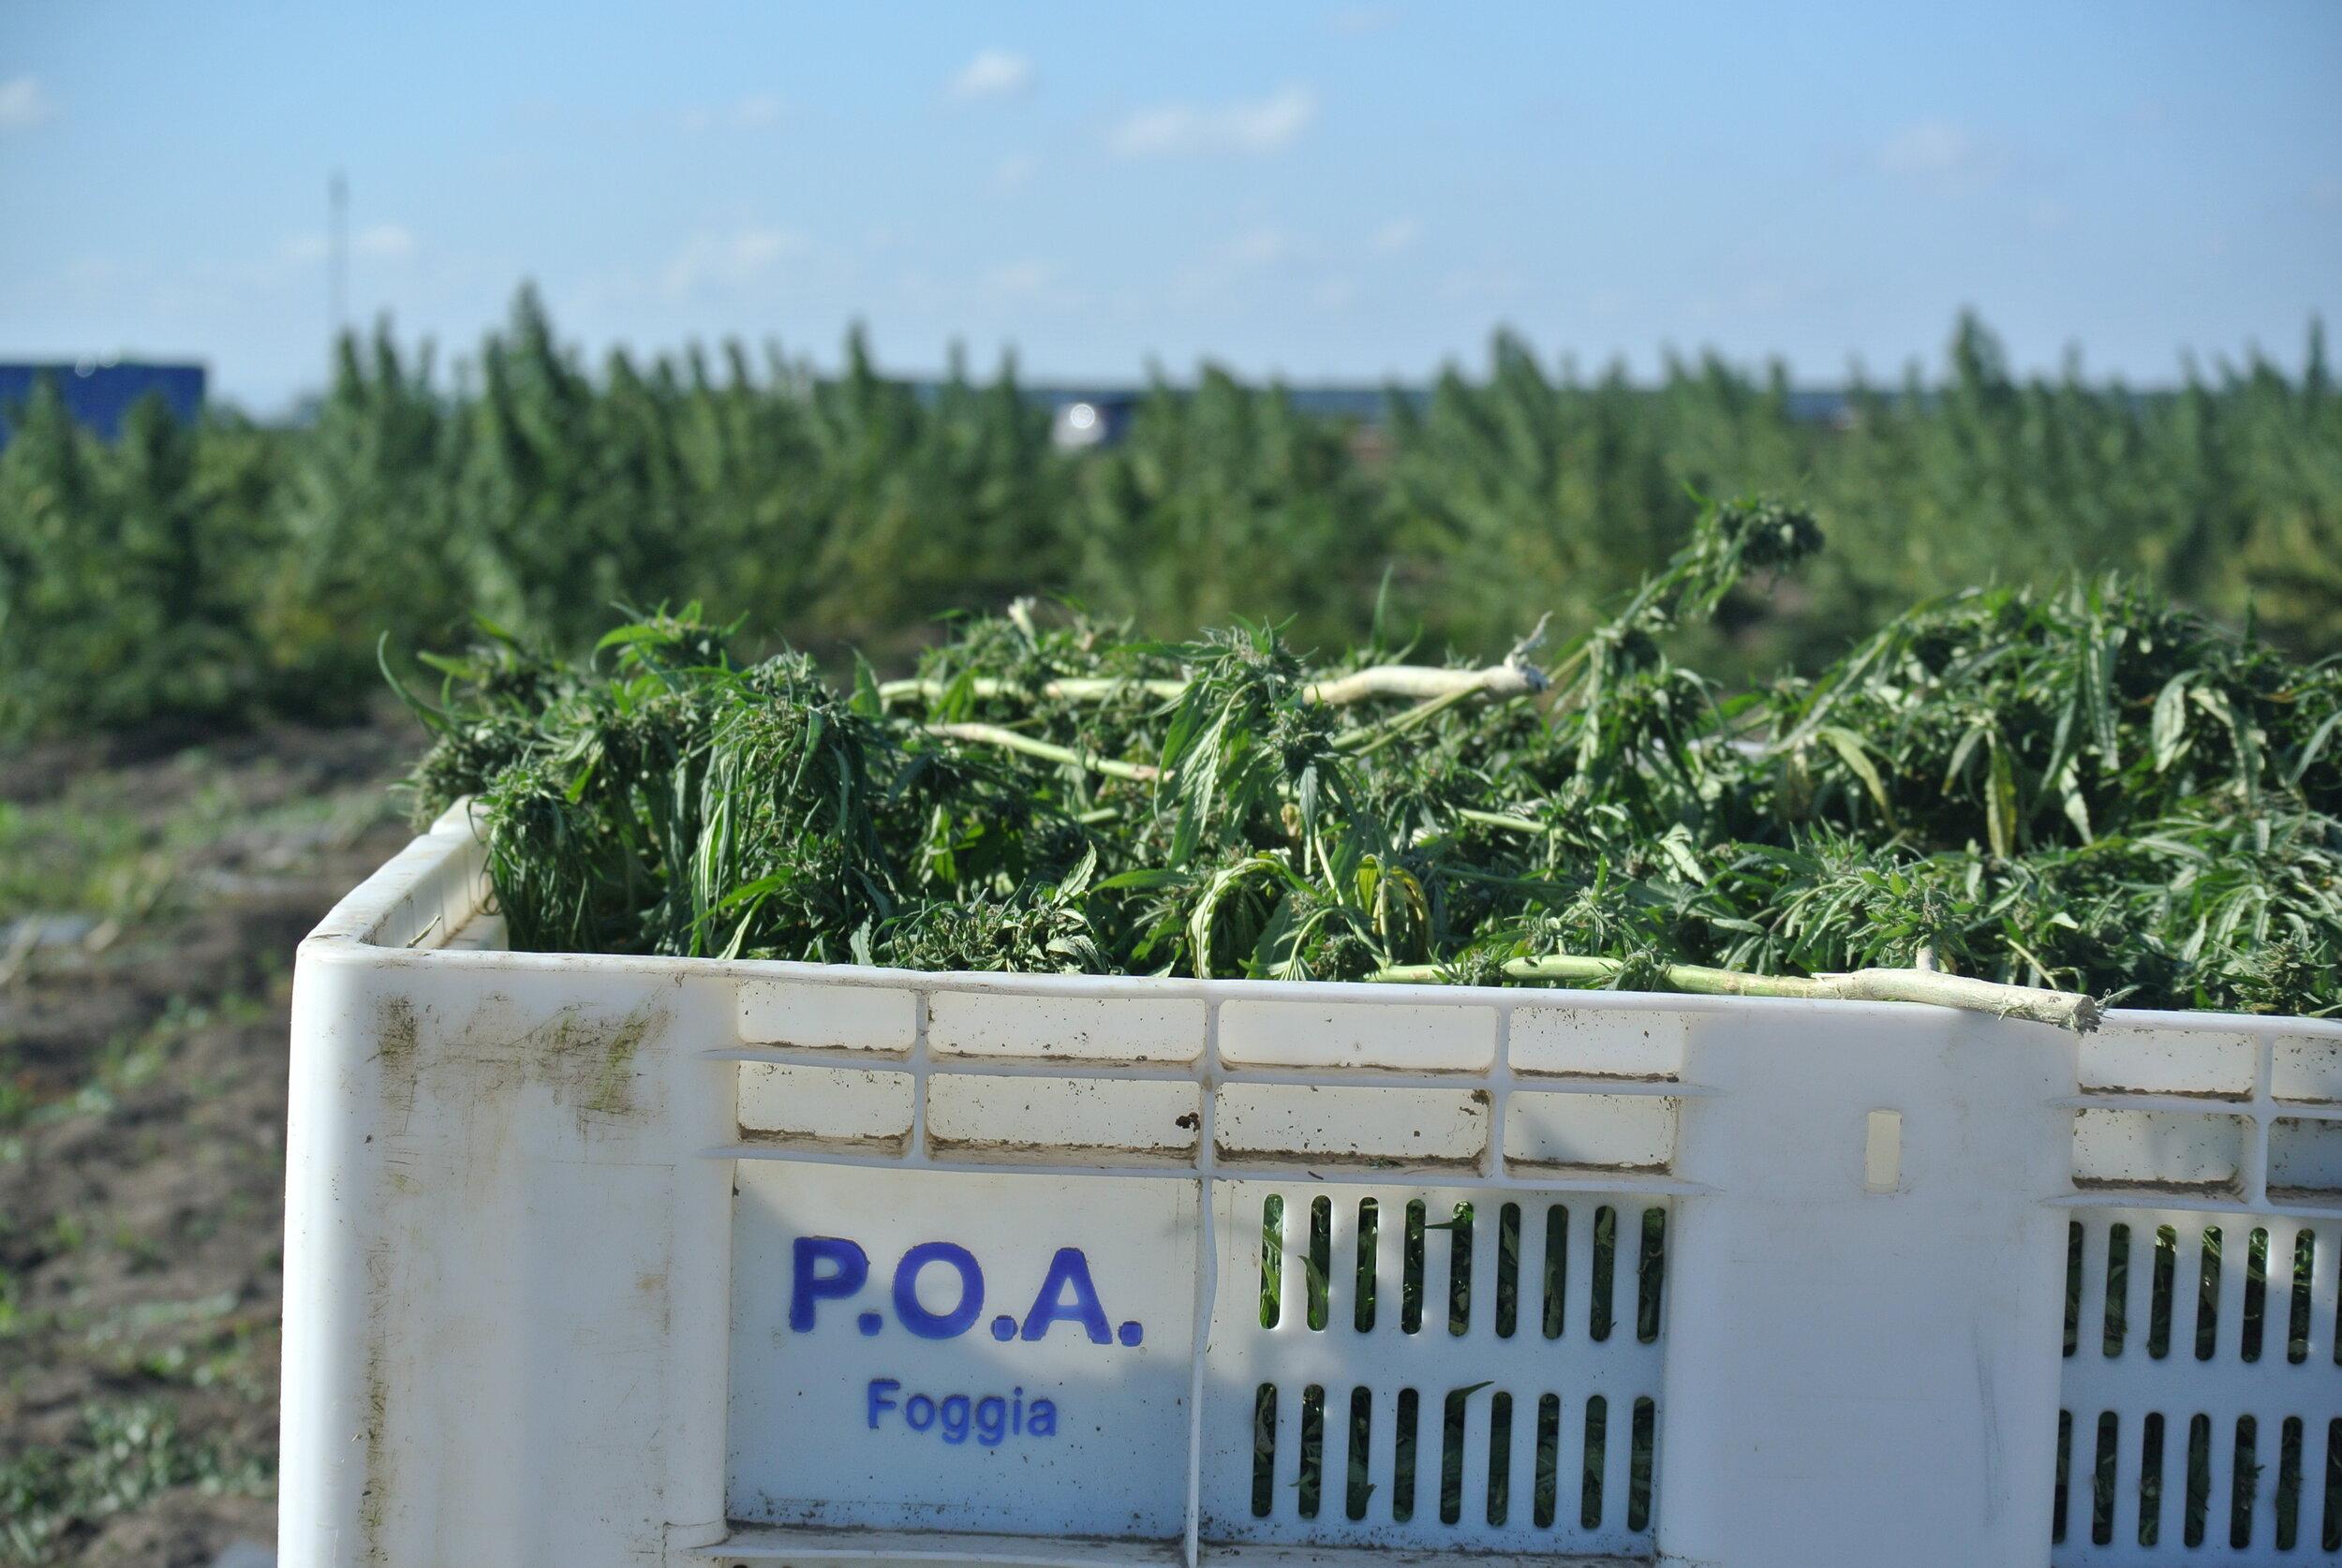 Migrant-harvested marijuana, in Foggia, Italy. 8 October 2019. ©Pamela Kerpius